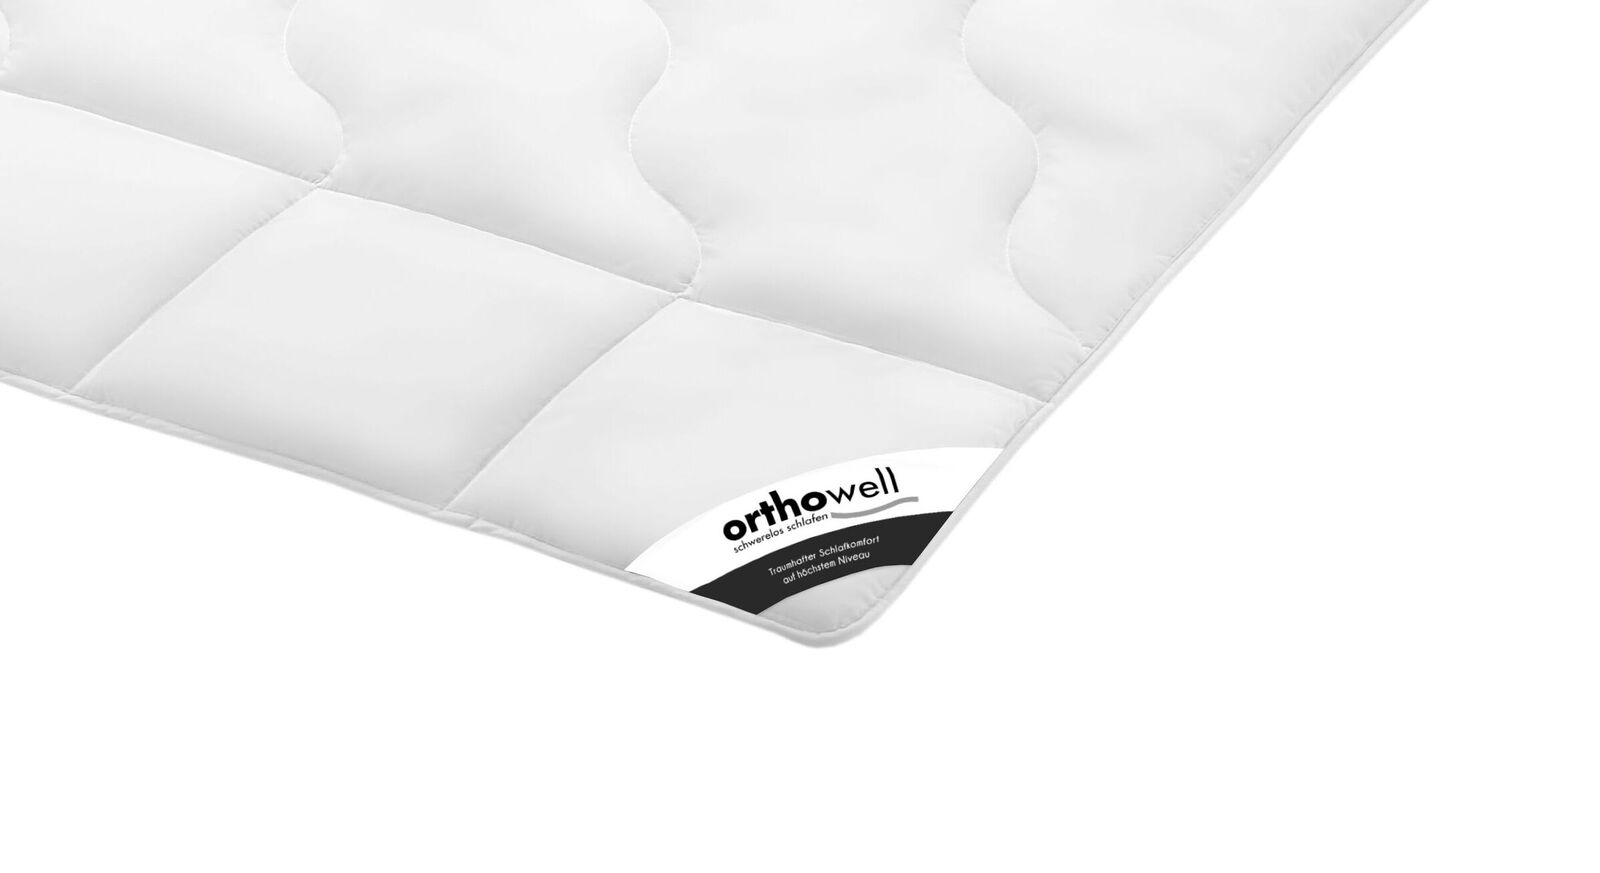 Preiswerte Faser-Bettdecke orthowell Standard warm